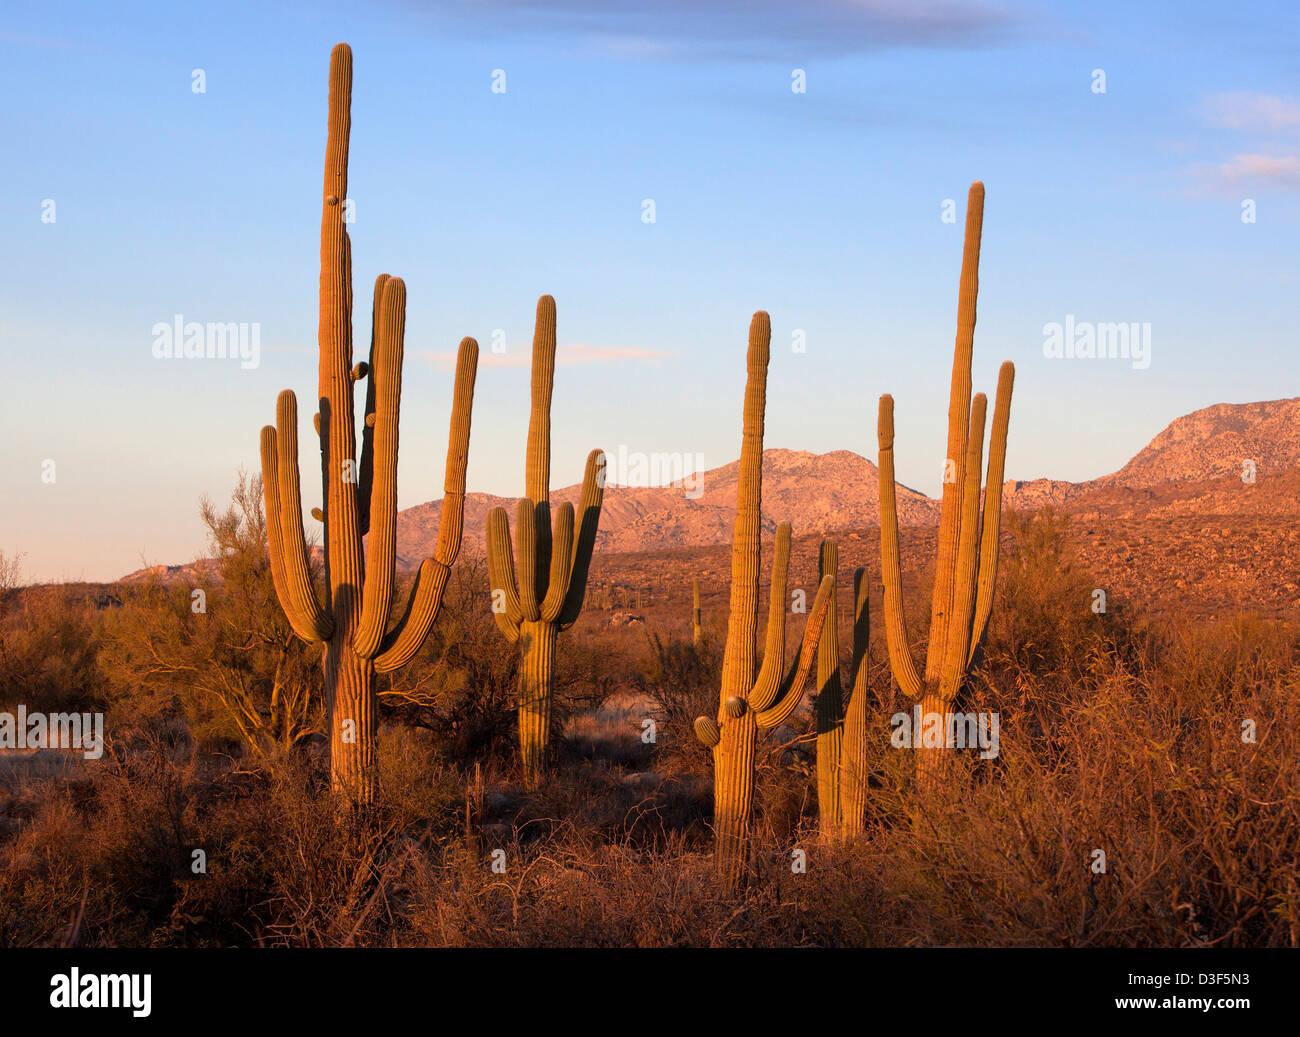 Stellung des Saguaro-Kaktus in Catalina State Park, Arizona, USA Stockfoto